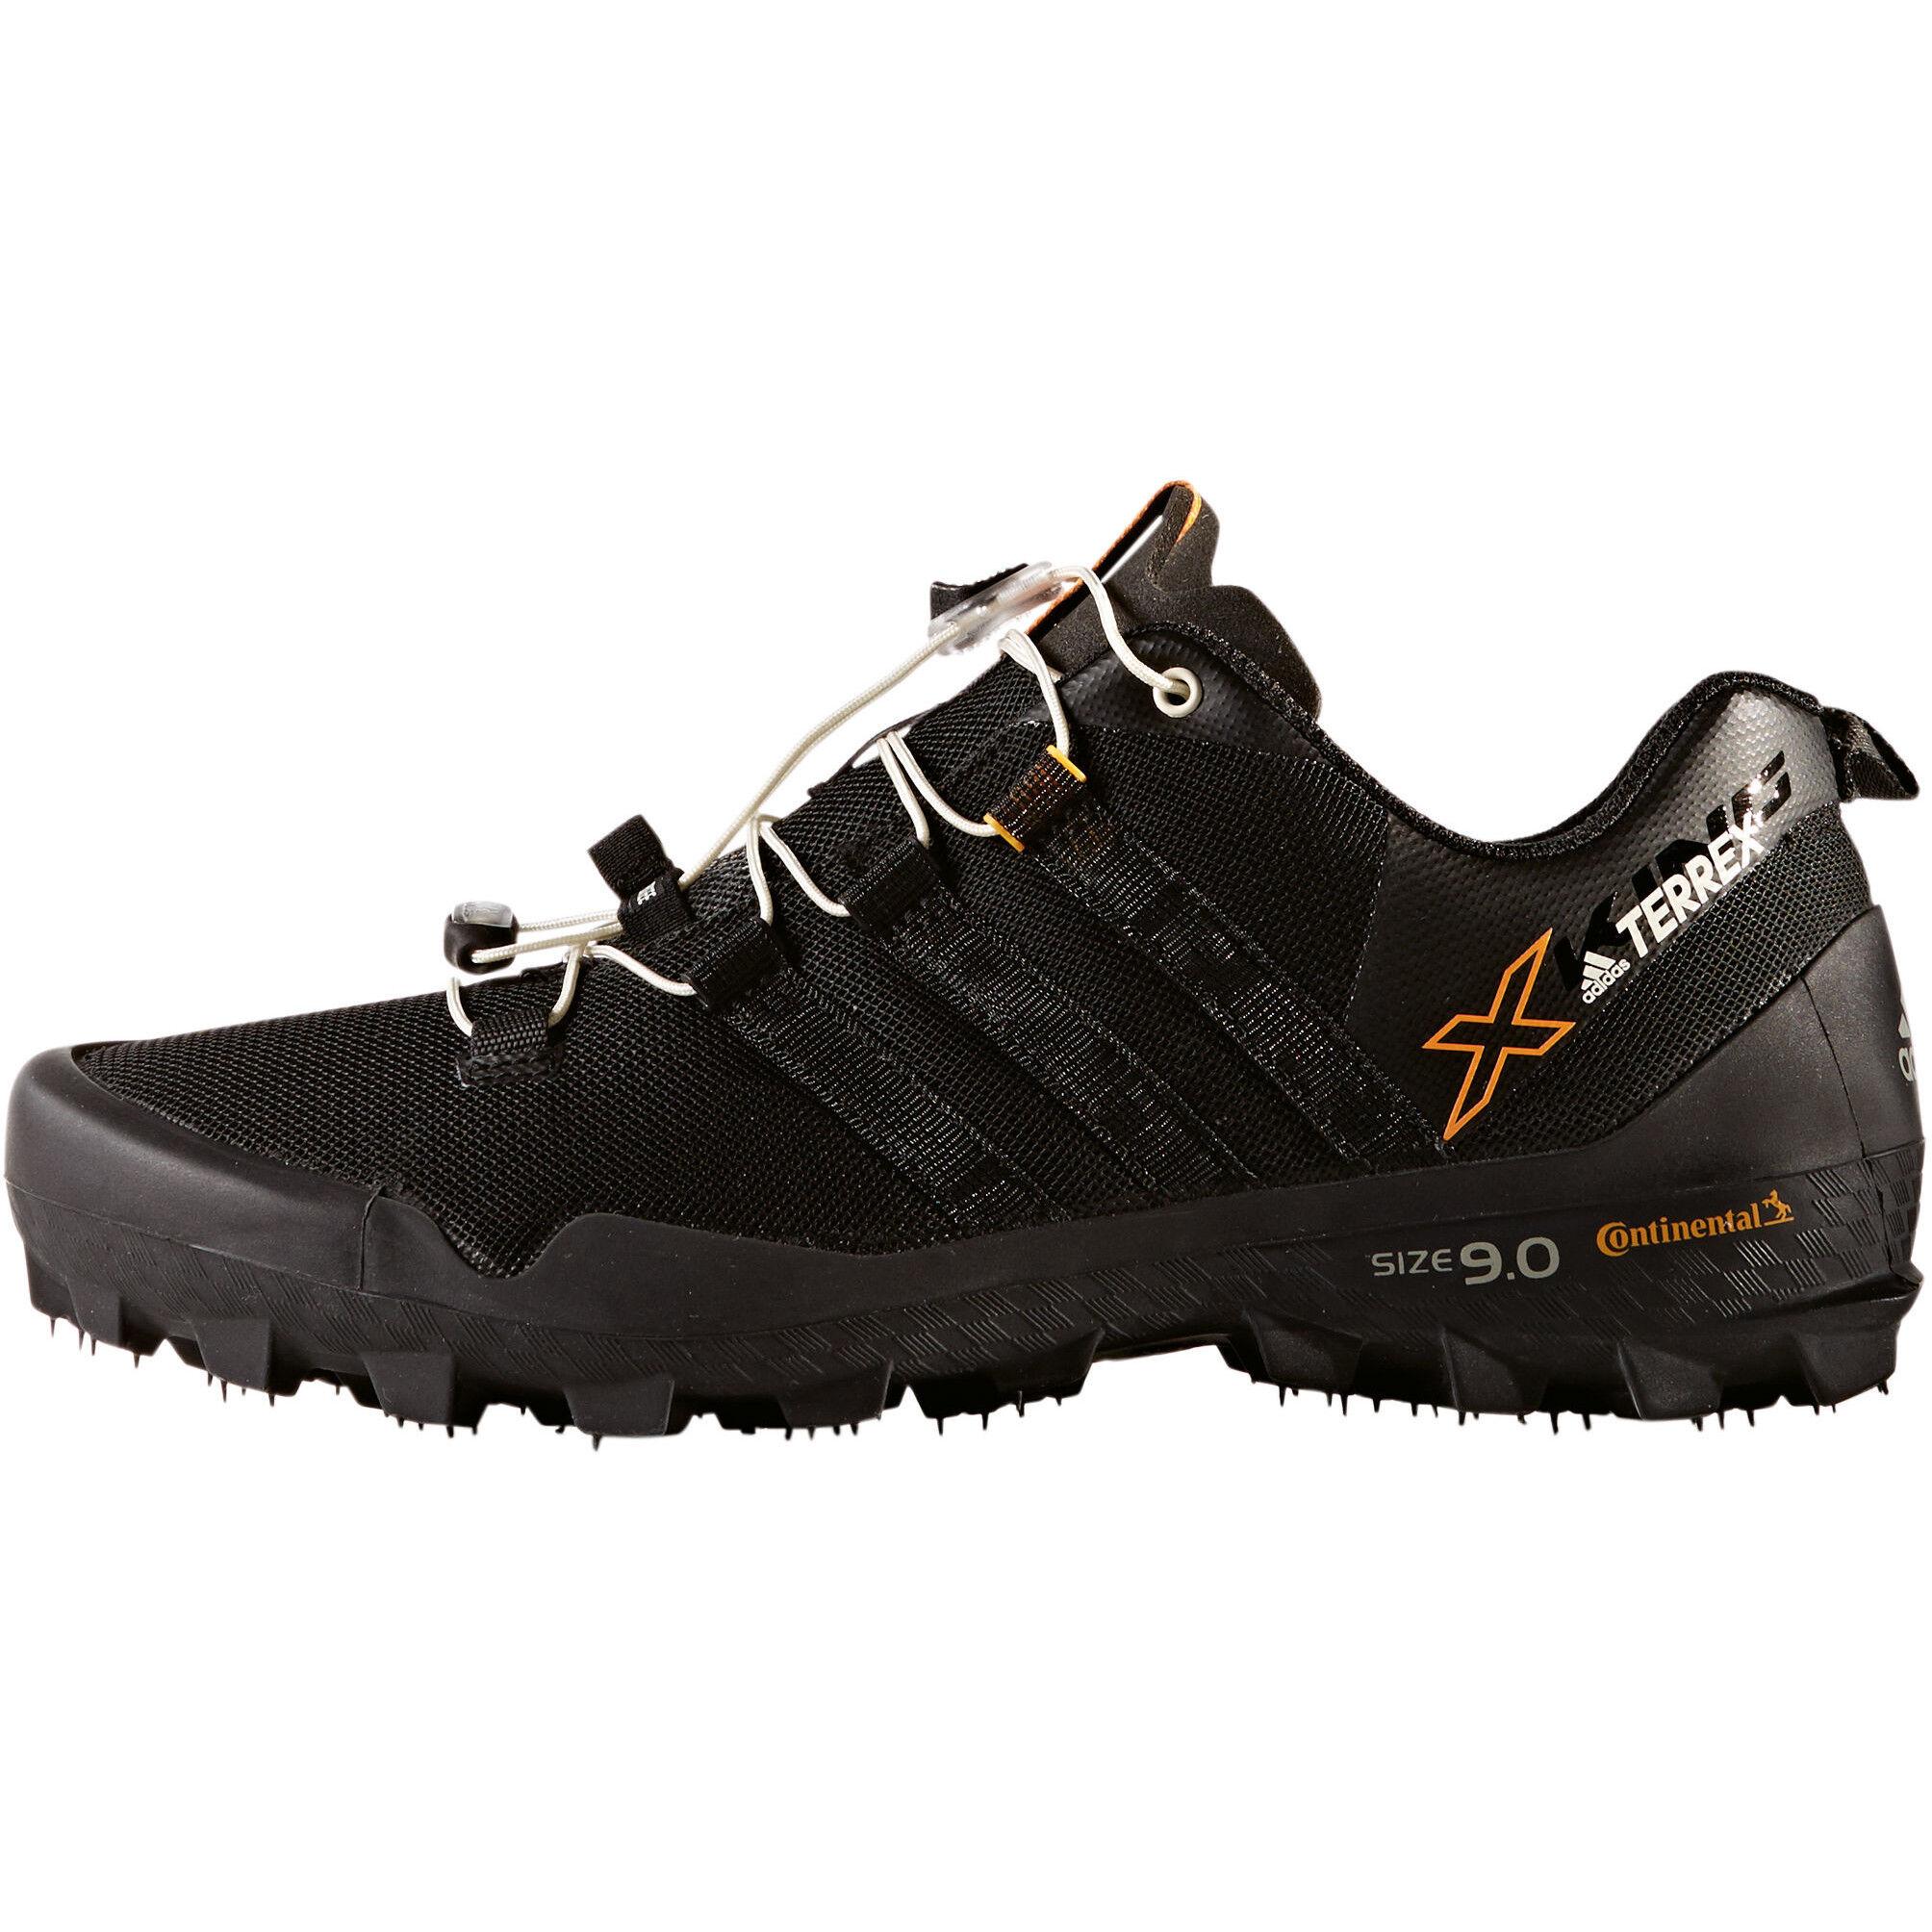 3A5RjL4 adidas adidas terrex king x schuhe nwmN0vy8O